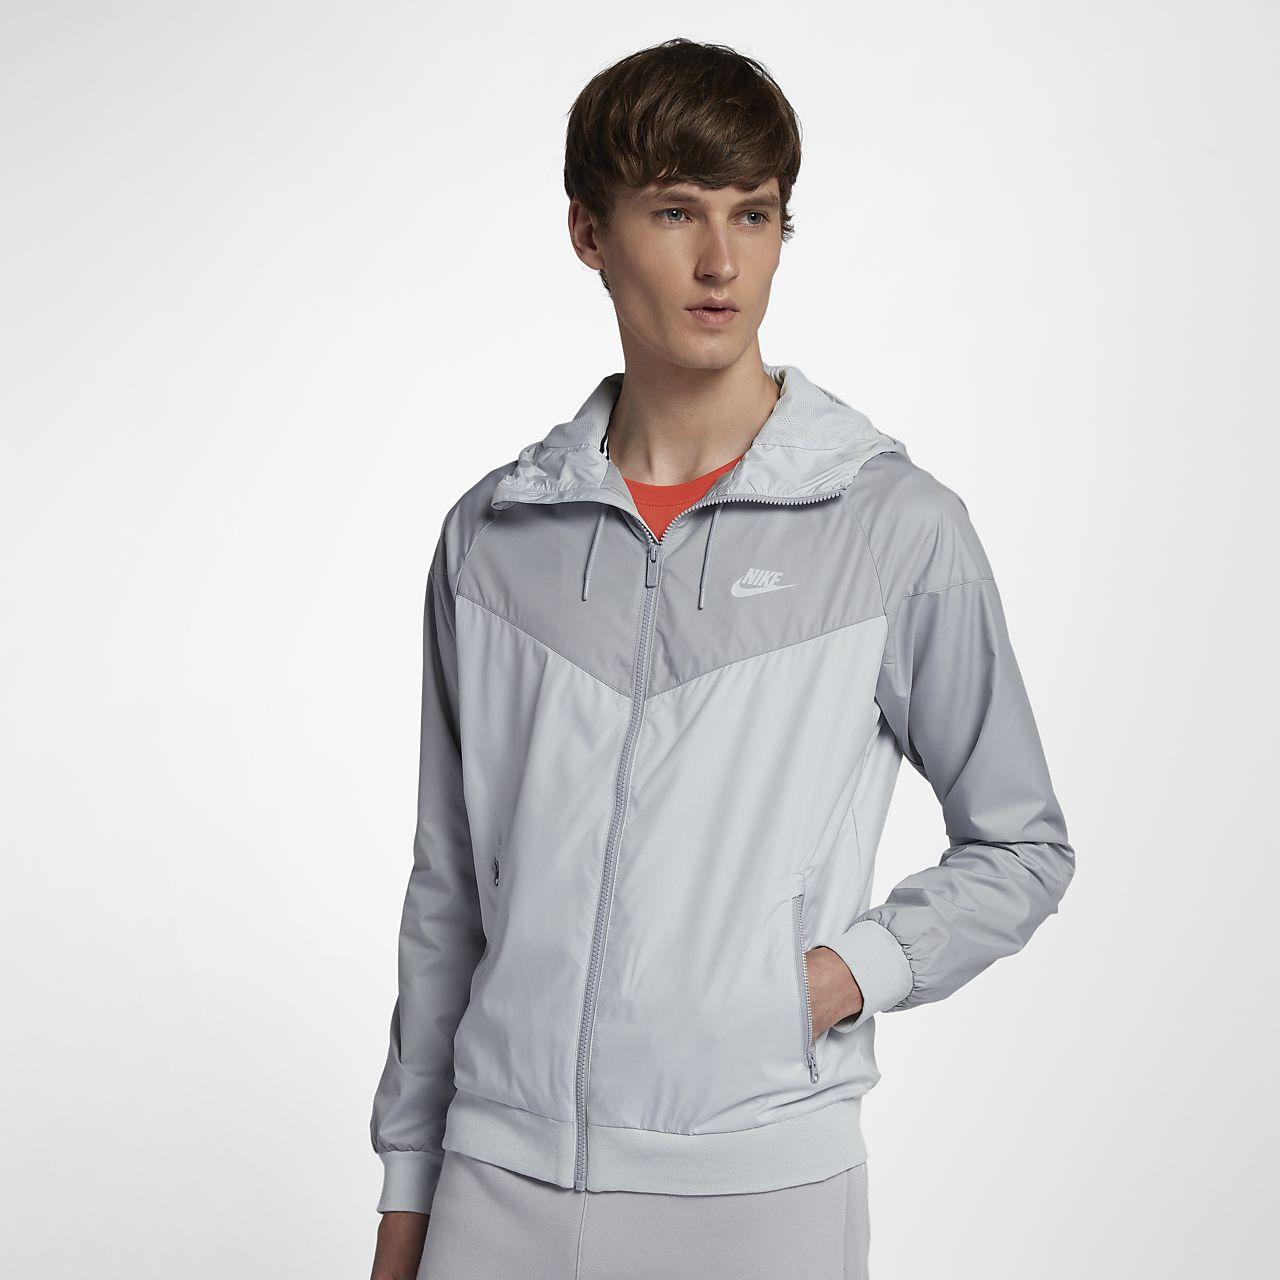 6585ecdf Low Resolution Мужская куртка Nike Sportswear Windrunner Мужская куртка  Nike Sportswear Windrunner